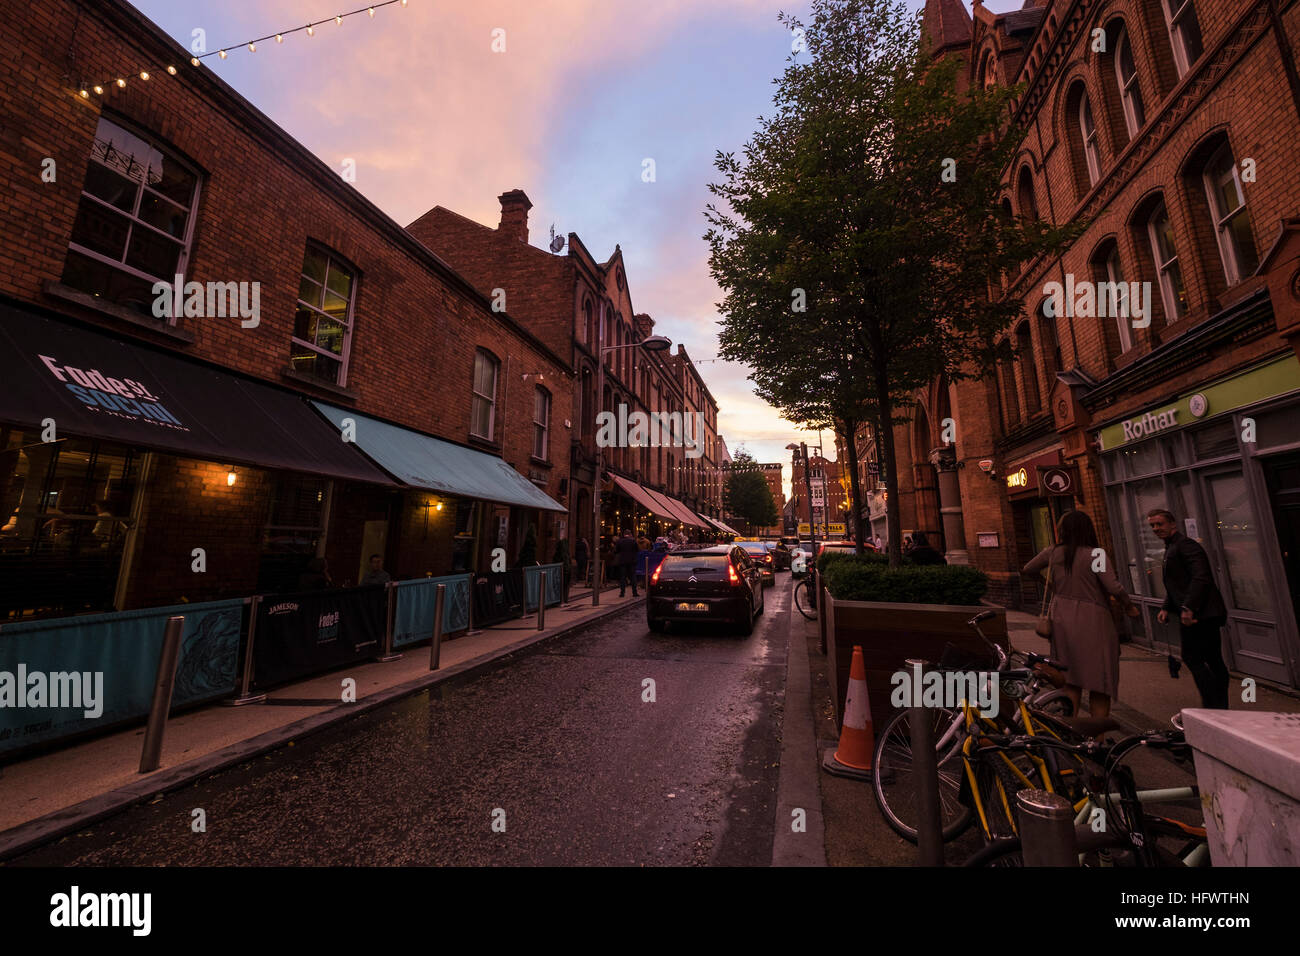 Red brick buildings at dusk in Fade Street, Dublin, Ireland - Stock Image